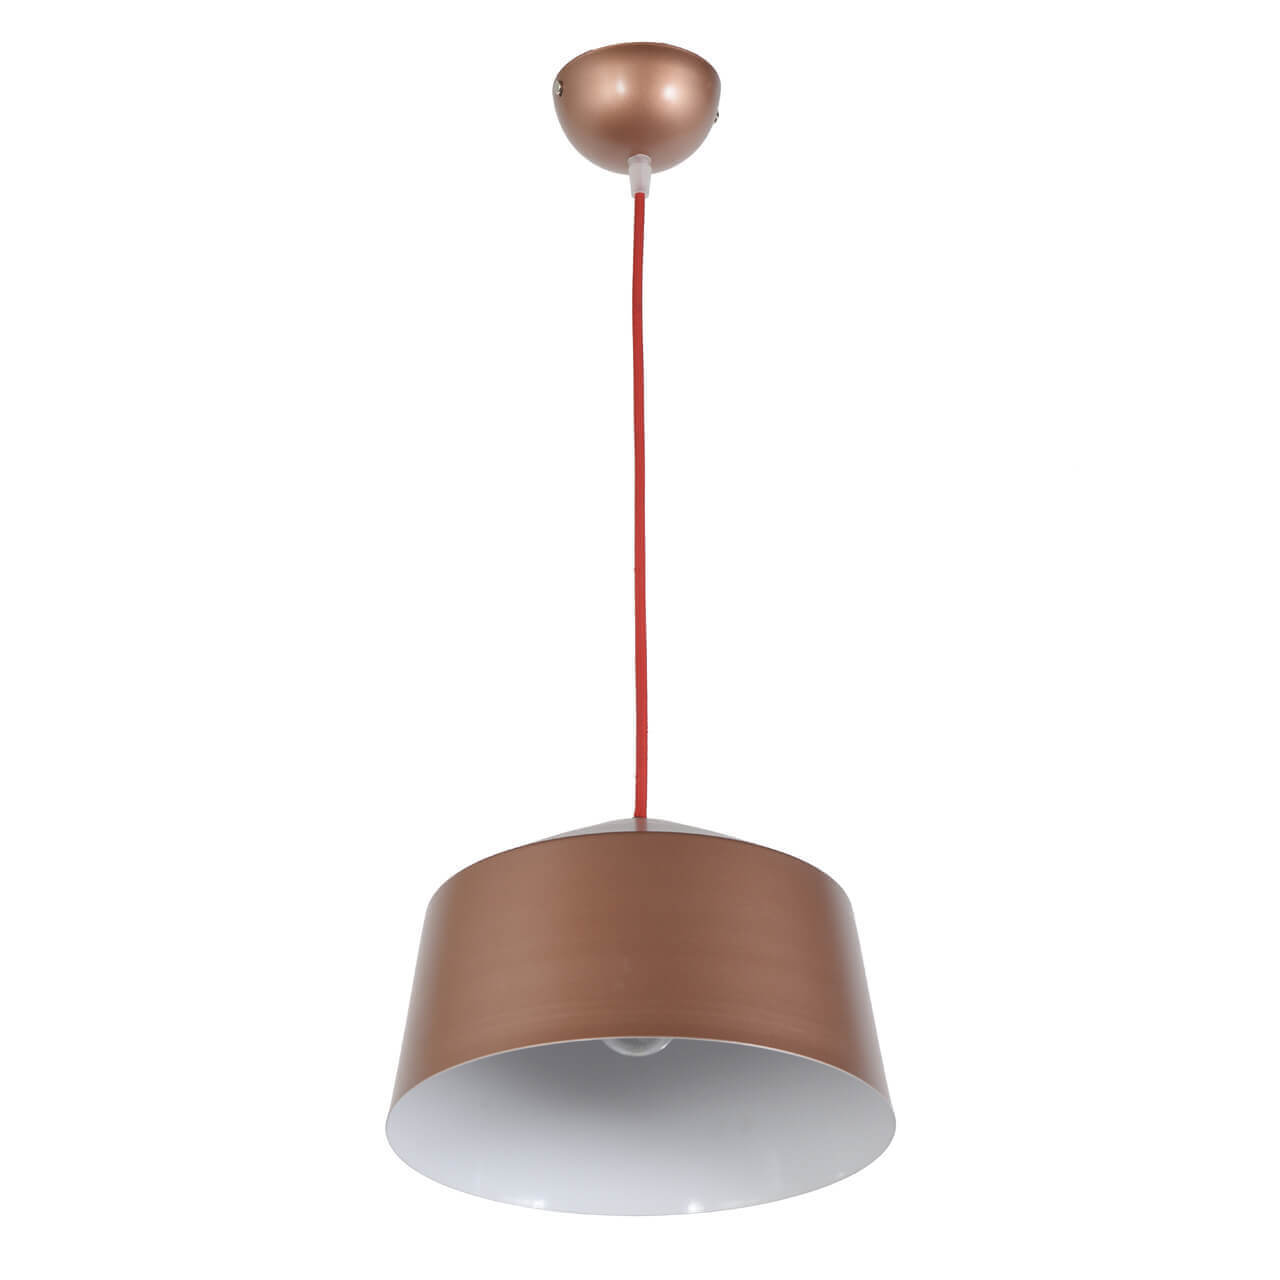 цена Светильник Arti Lampadari Tempo E 1.3.P1 BR Tempo онлайн в 2017 году